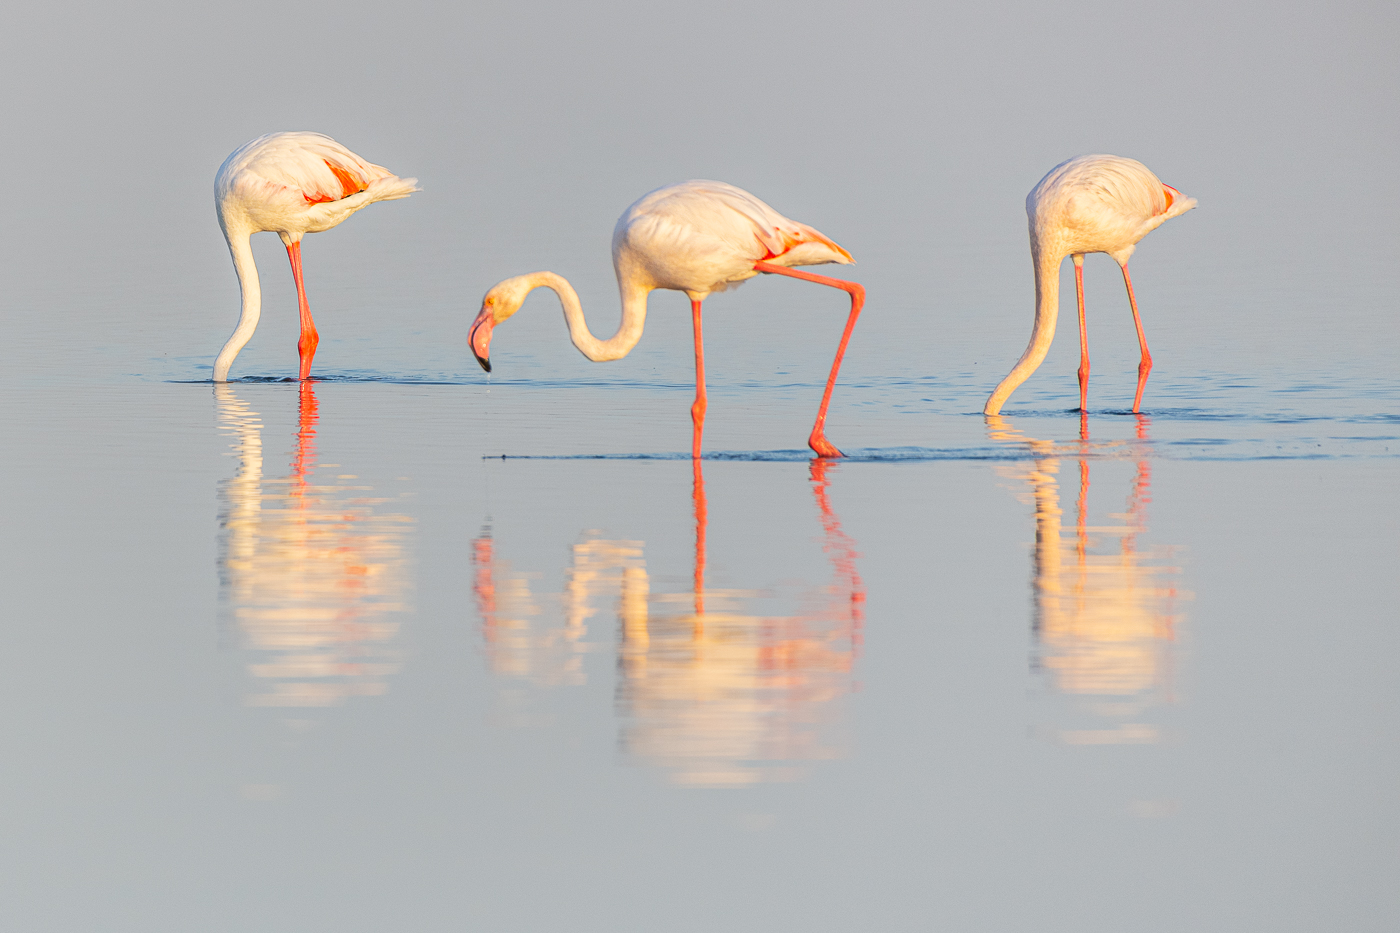 PRINT-50Open_Lily_Chang_2_Flamingos_Feeding_in_Walvis_Bay